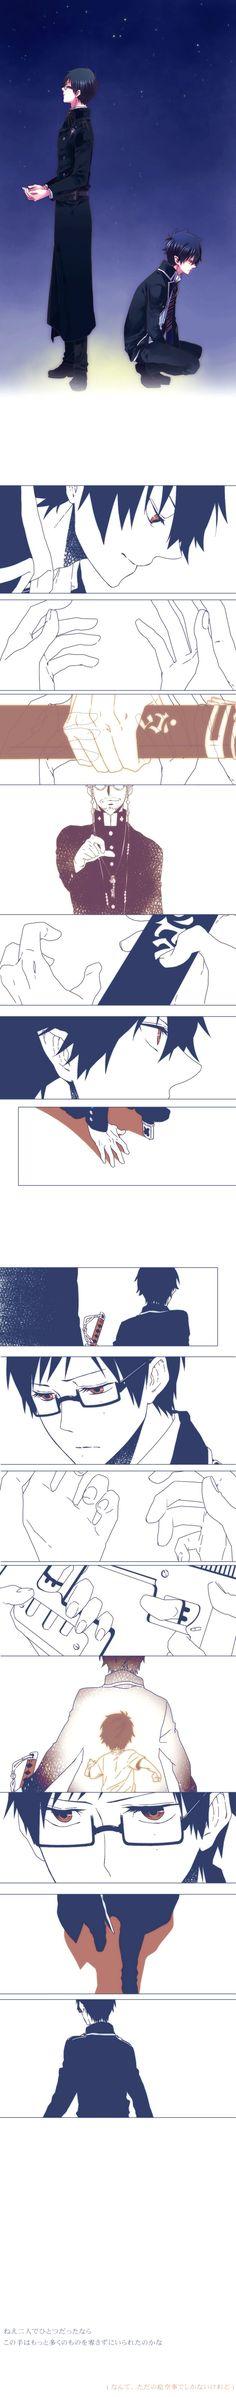 Tags: Anime, Demon, Ao no Exorcist, Okumura Rin, Okumura Yukio, Pixiv Id 474970, Fujimoto Shirou